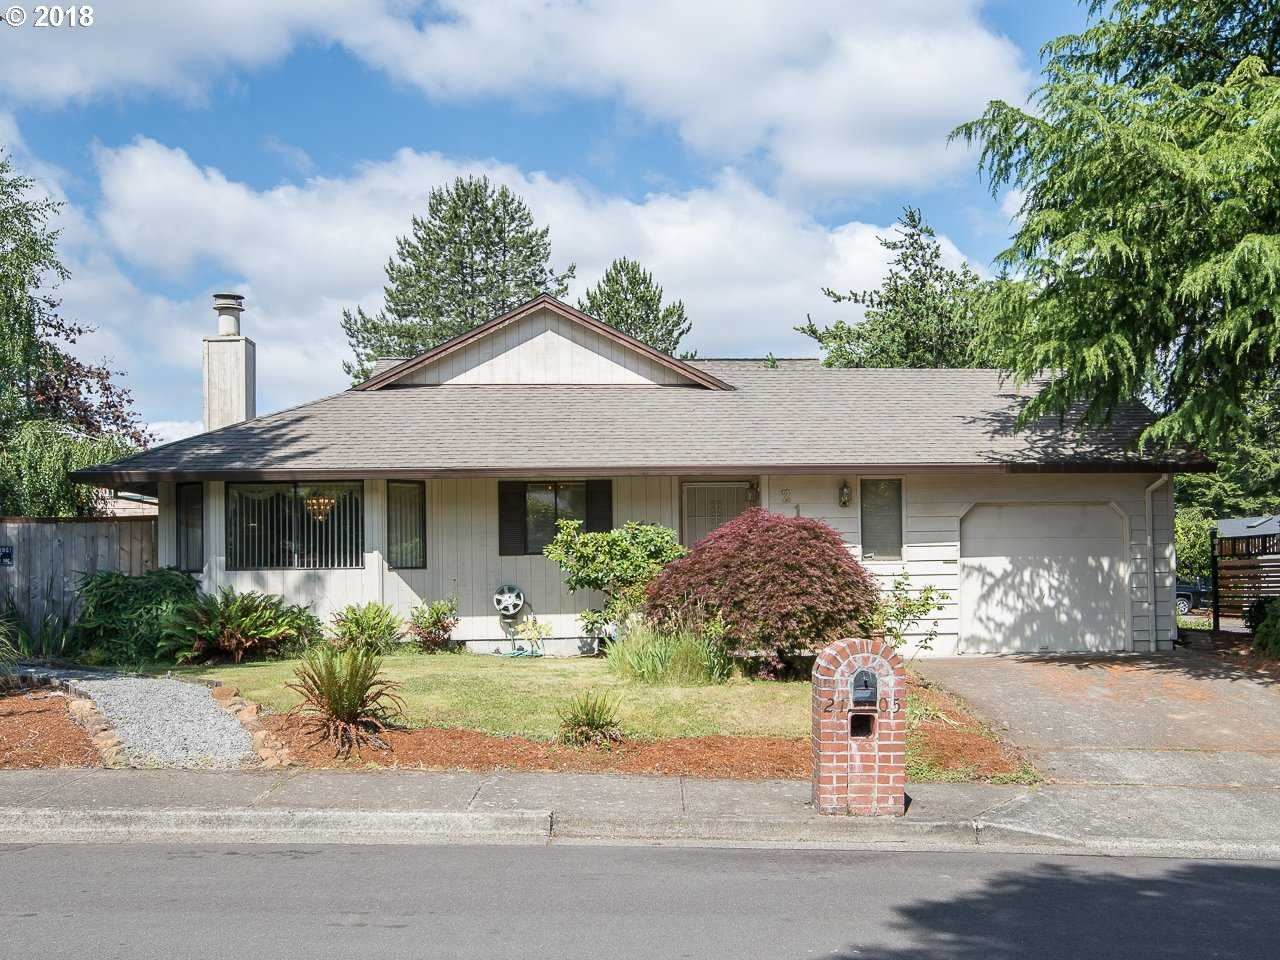 $275,000 - 3Br/2Ba -  for Sale in Beaverton